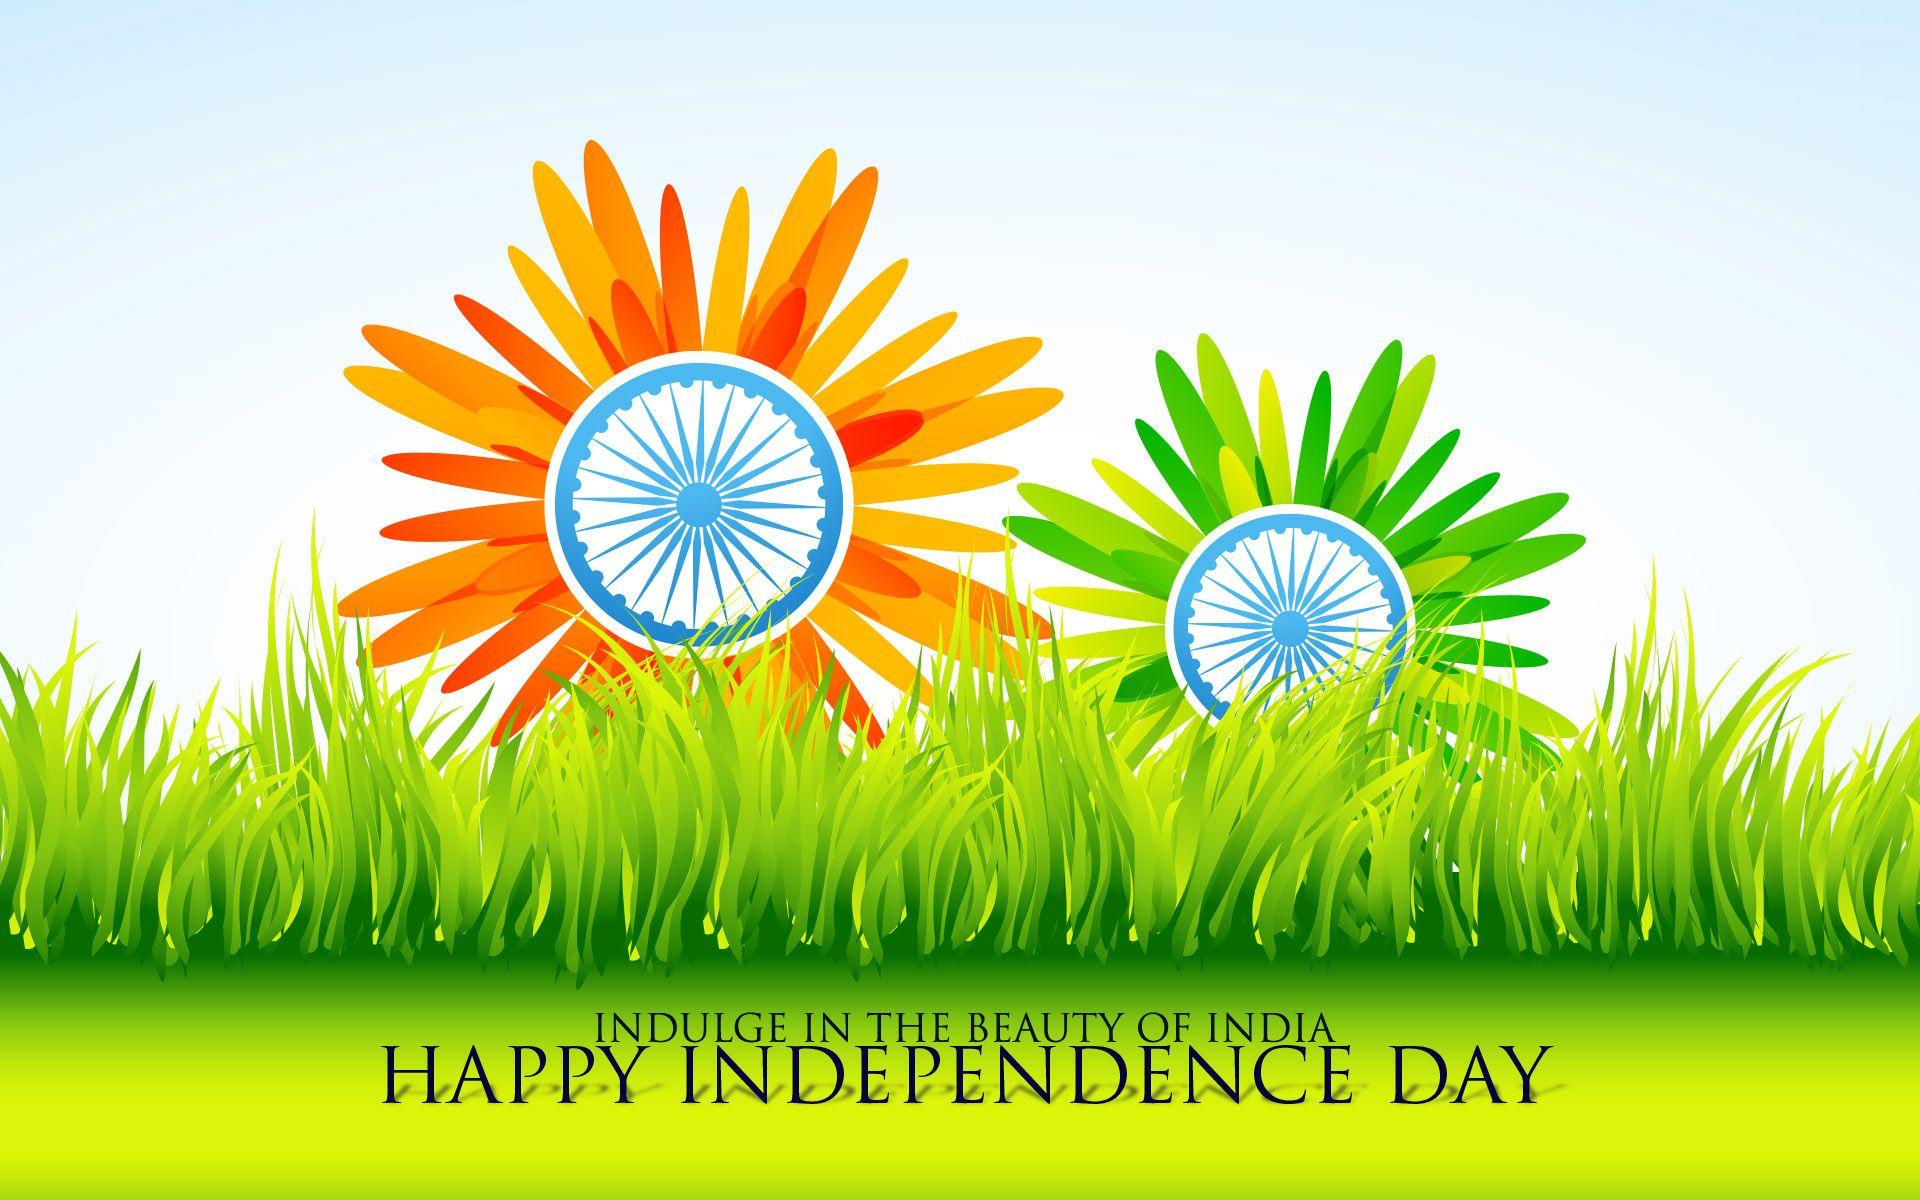 essay on indian independence स्व्तन्त्रता दिवस indian independence day 15th august – independence day hindi essay – swatantrata divas nibandh.